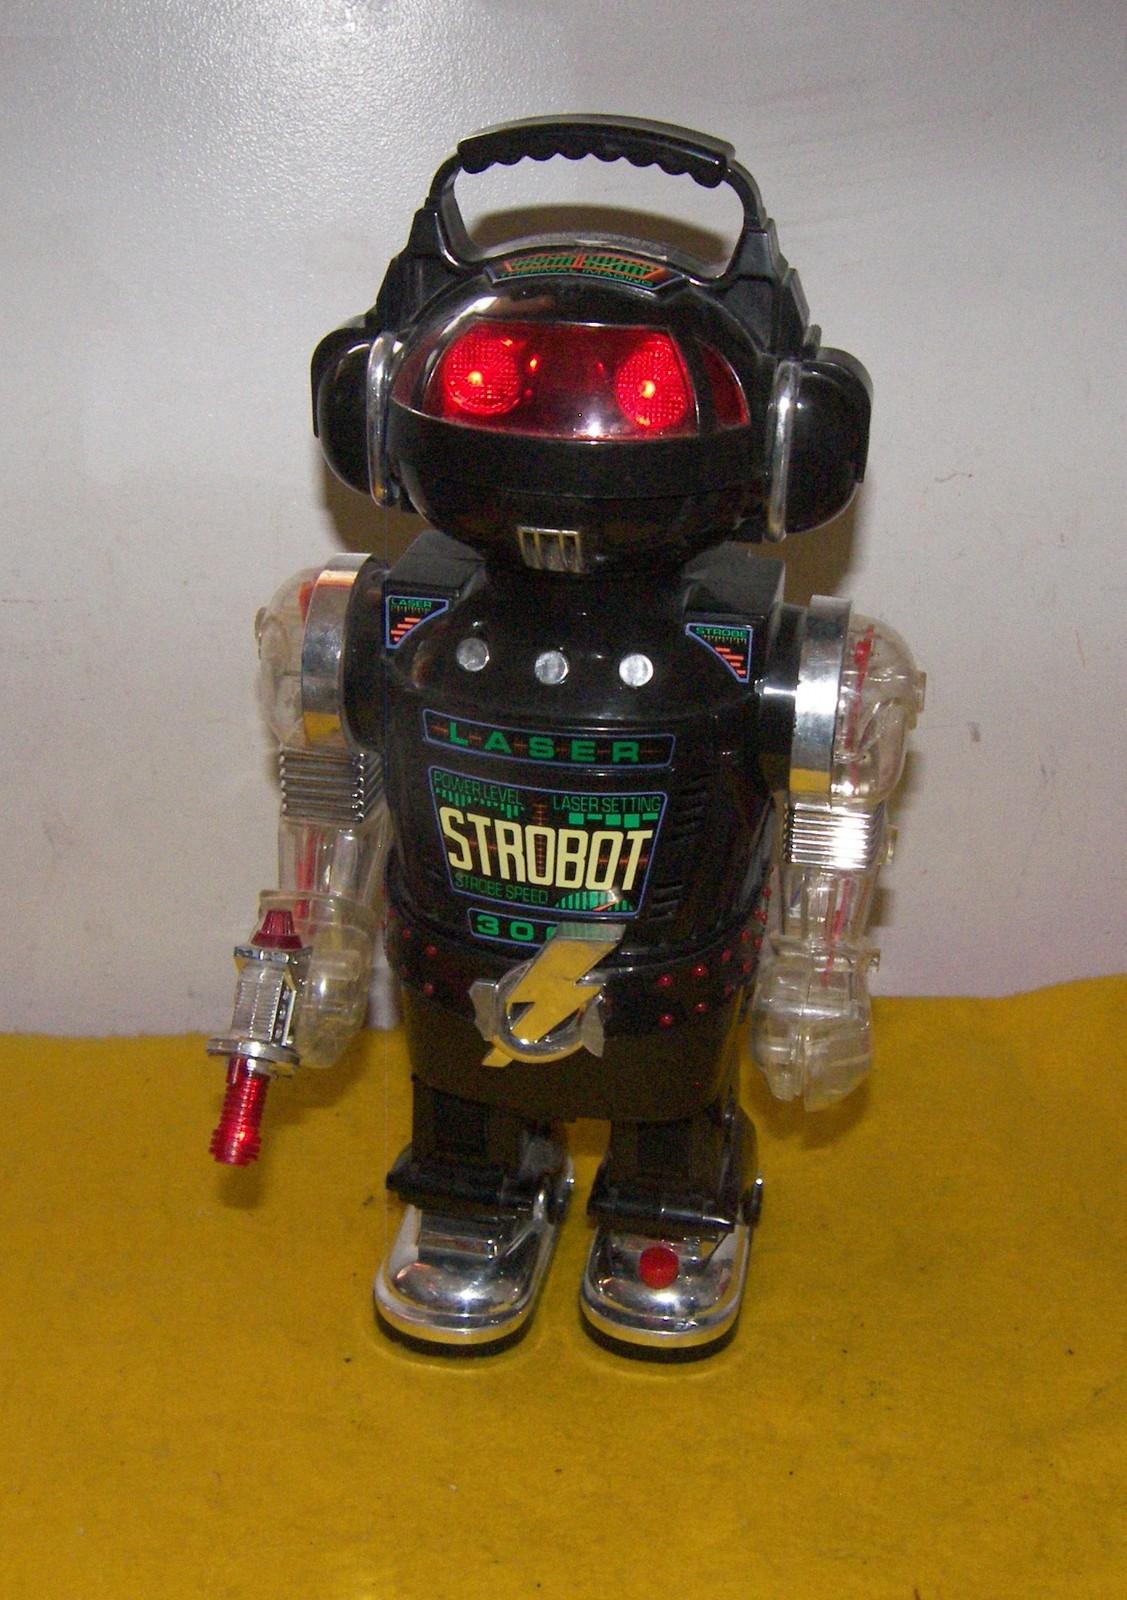 Robot strobot